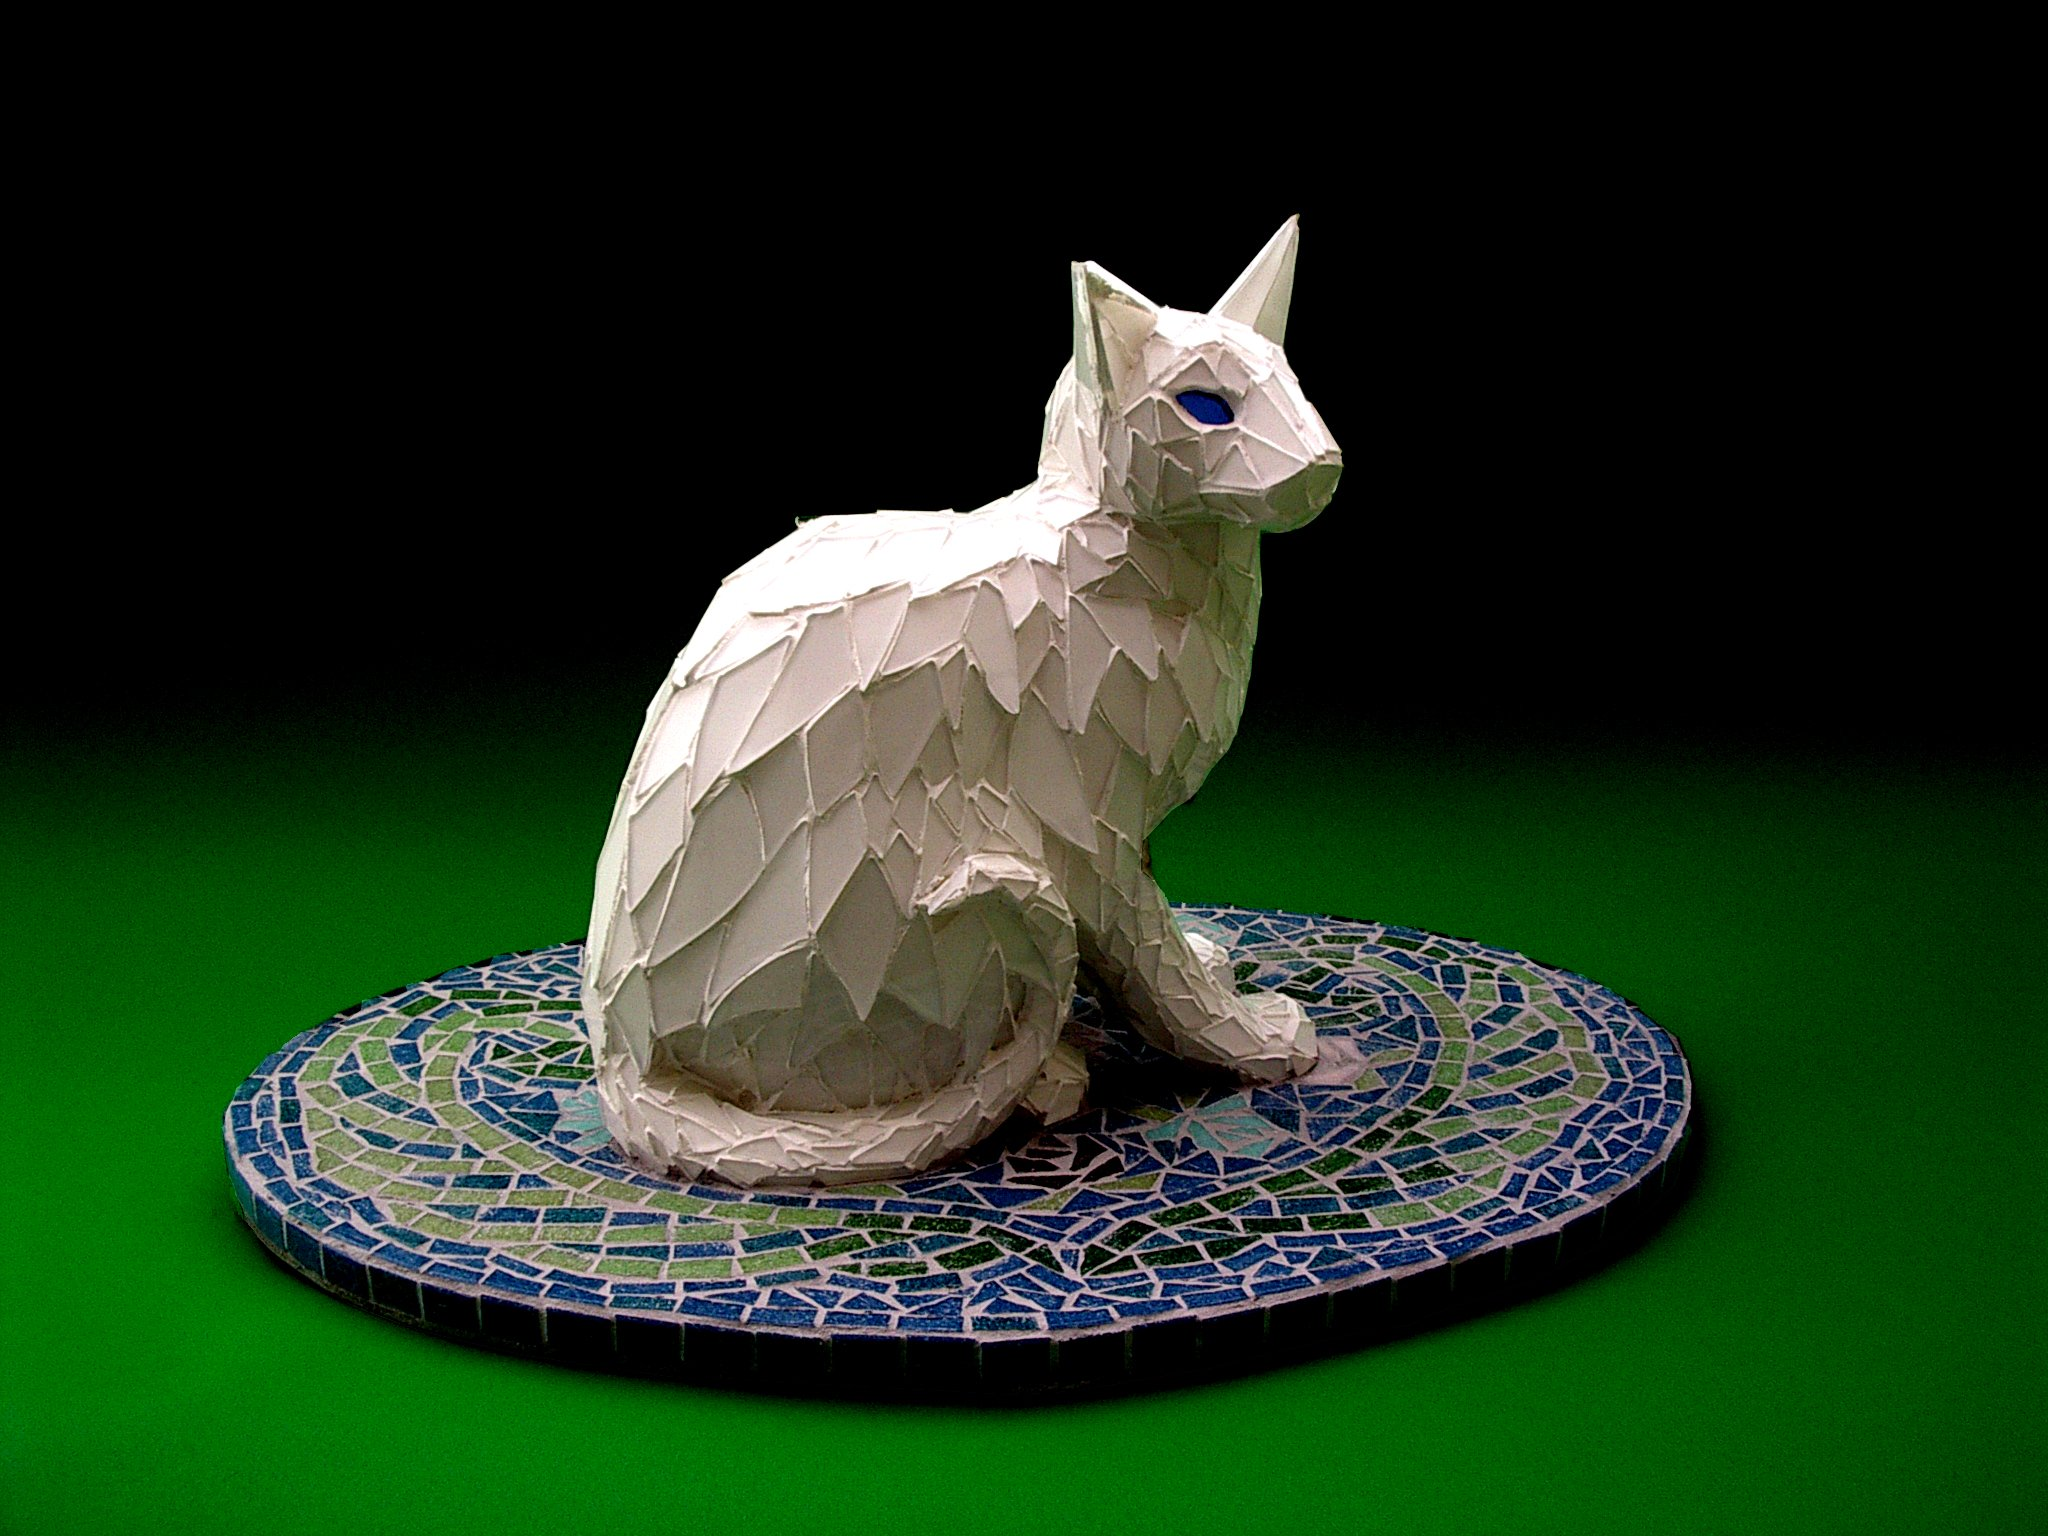 White Cat on Floral Carpet